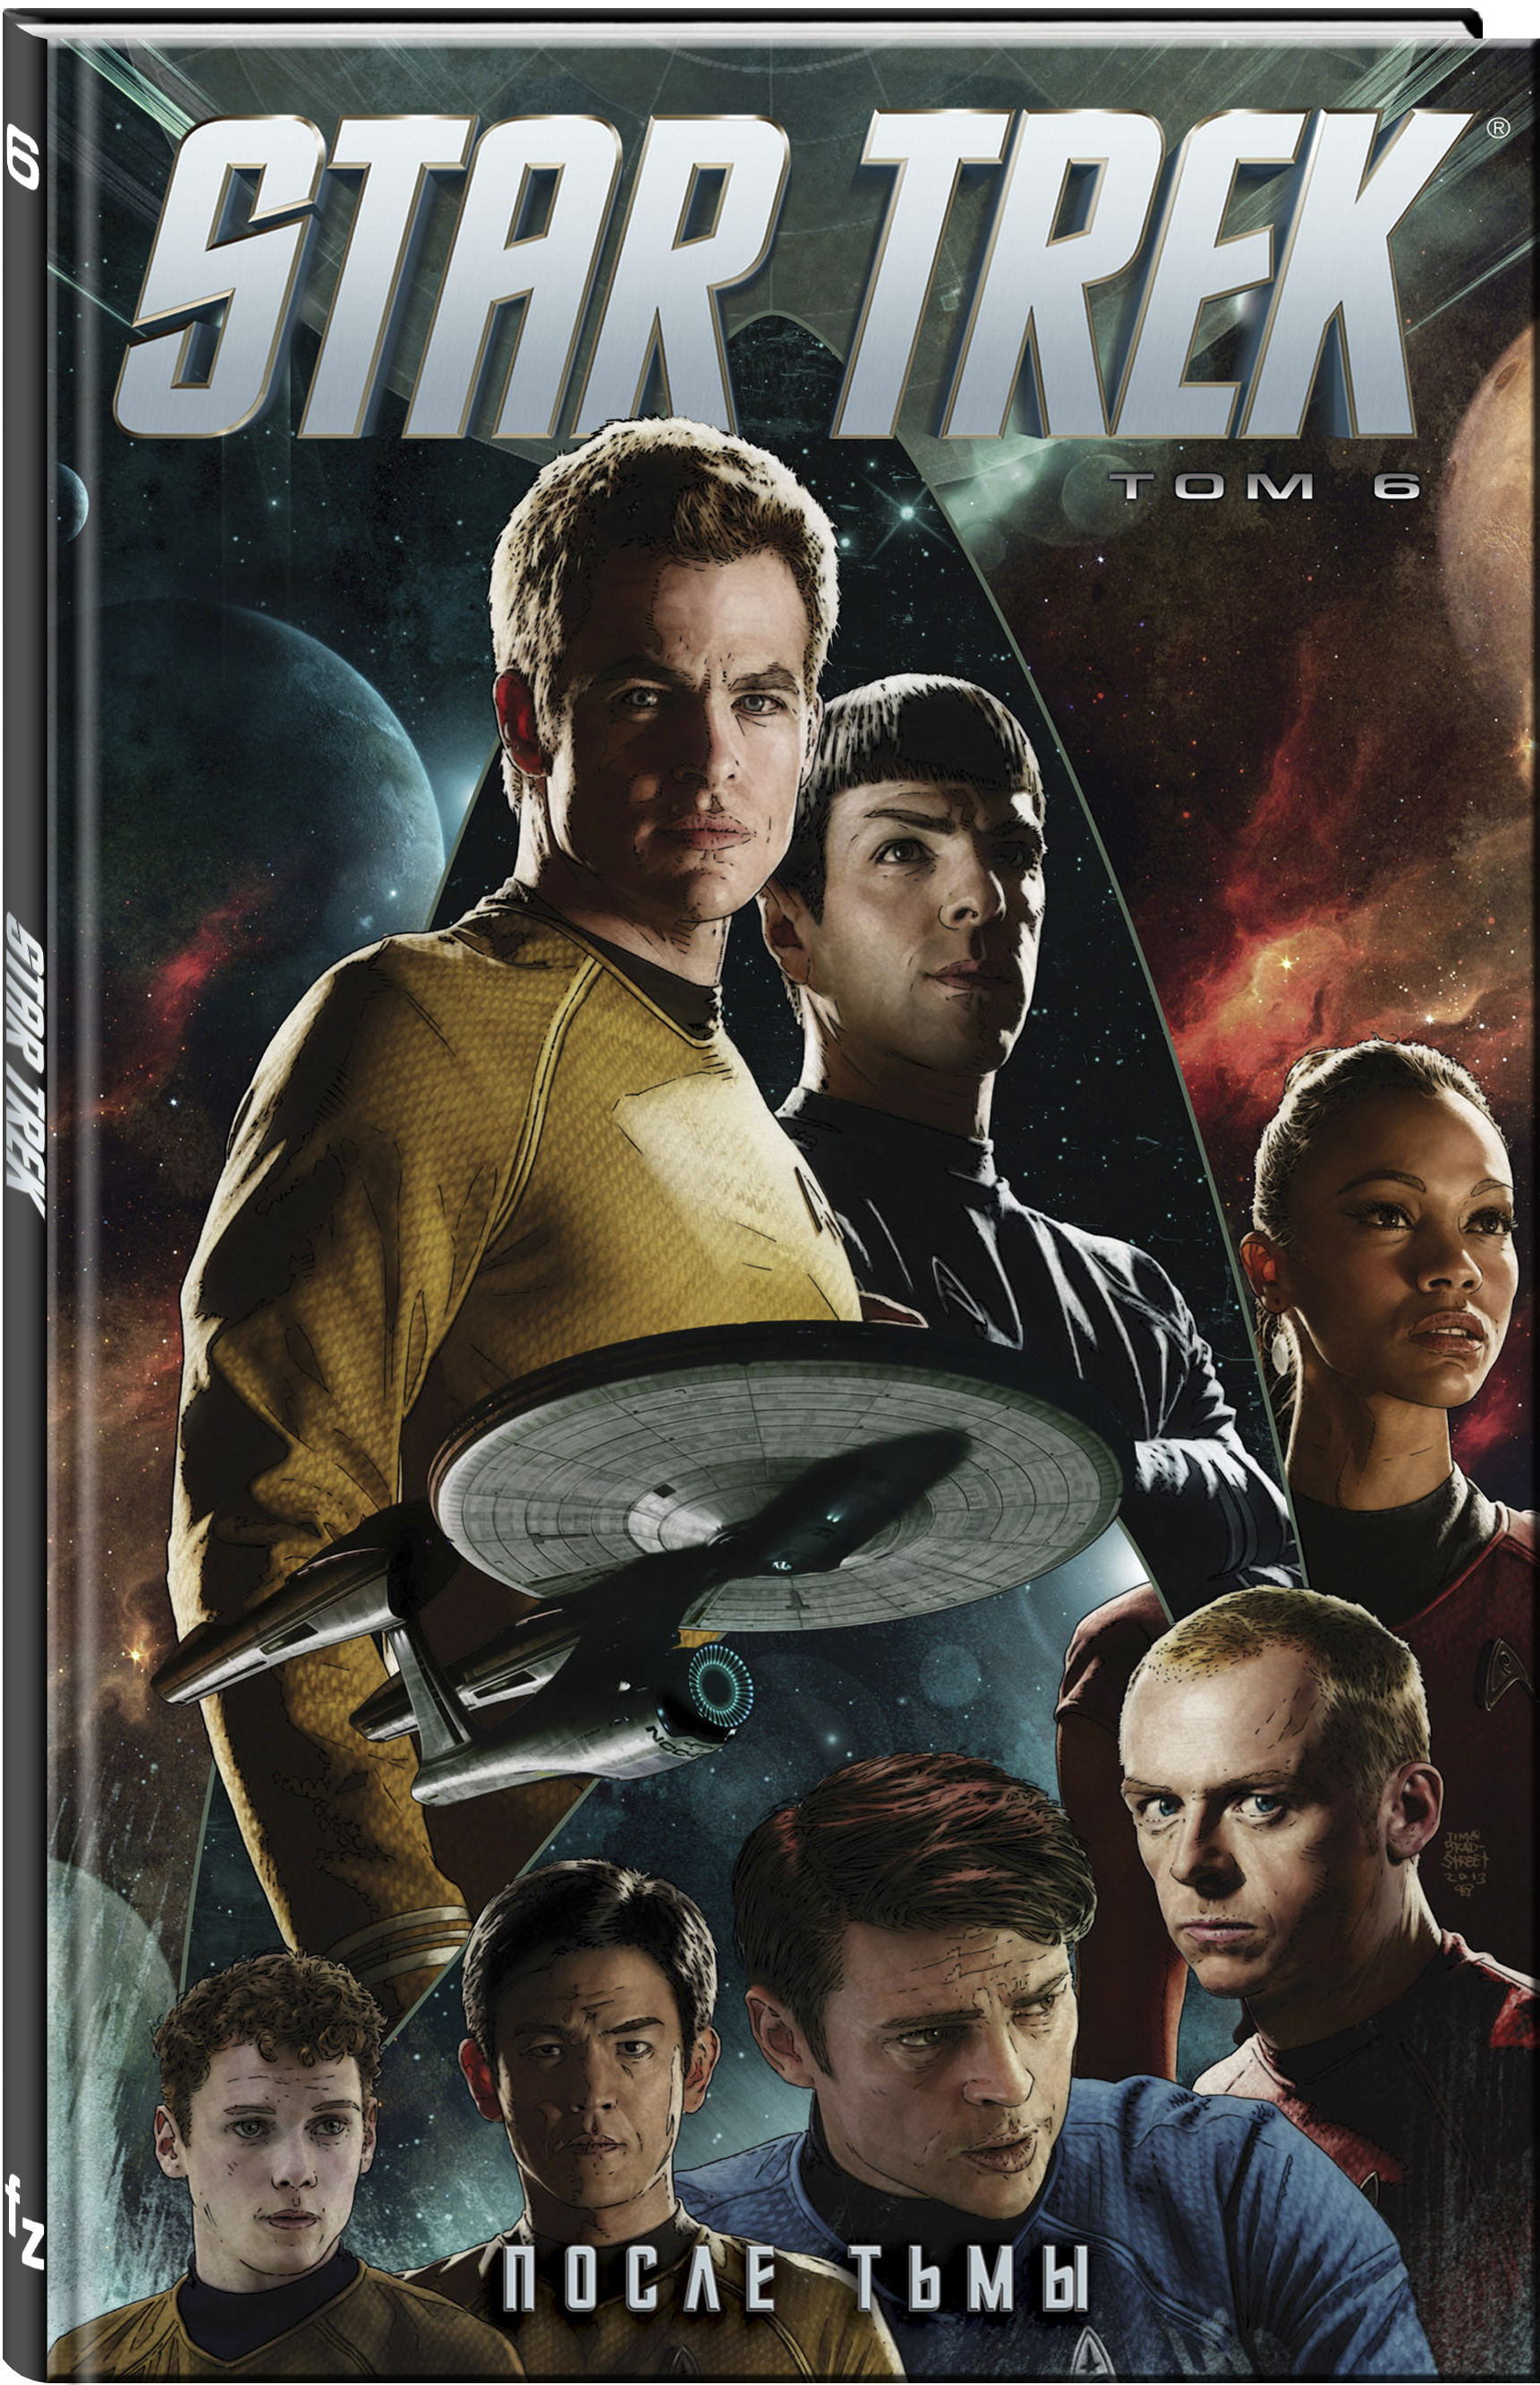 Джонсон М. Стартрек / Star Trek. Том 6: После тьмы джонсон м star trek том 4